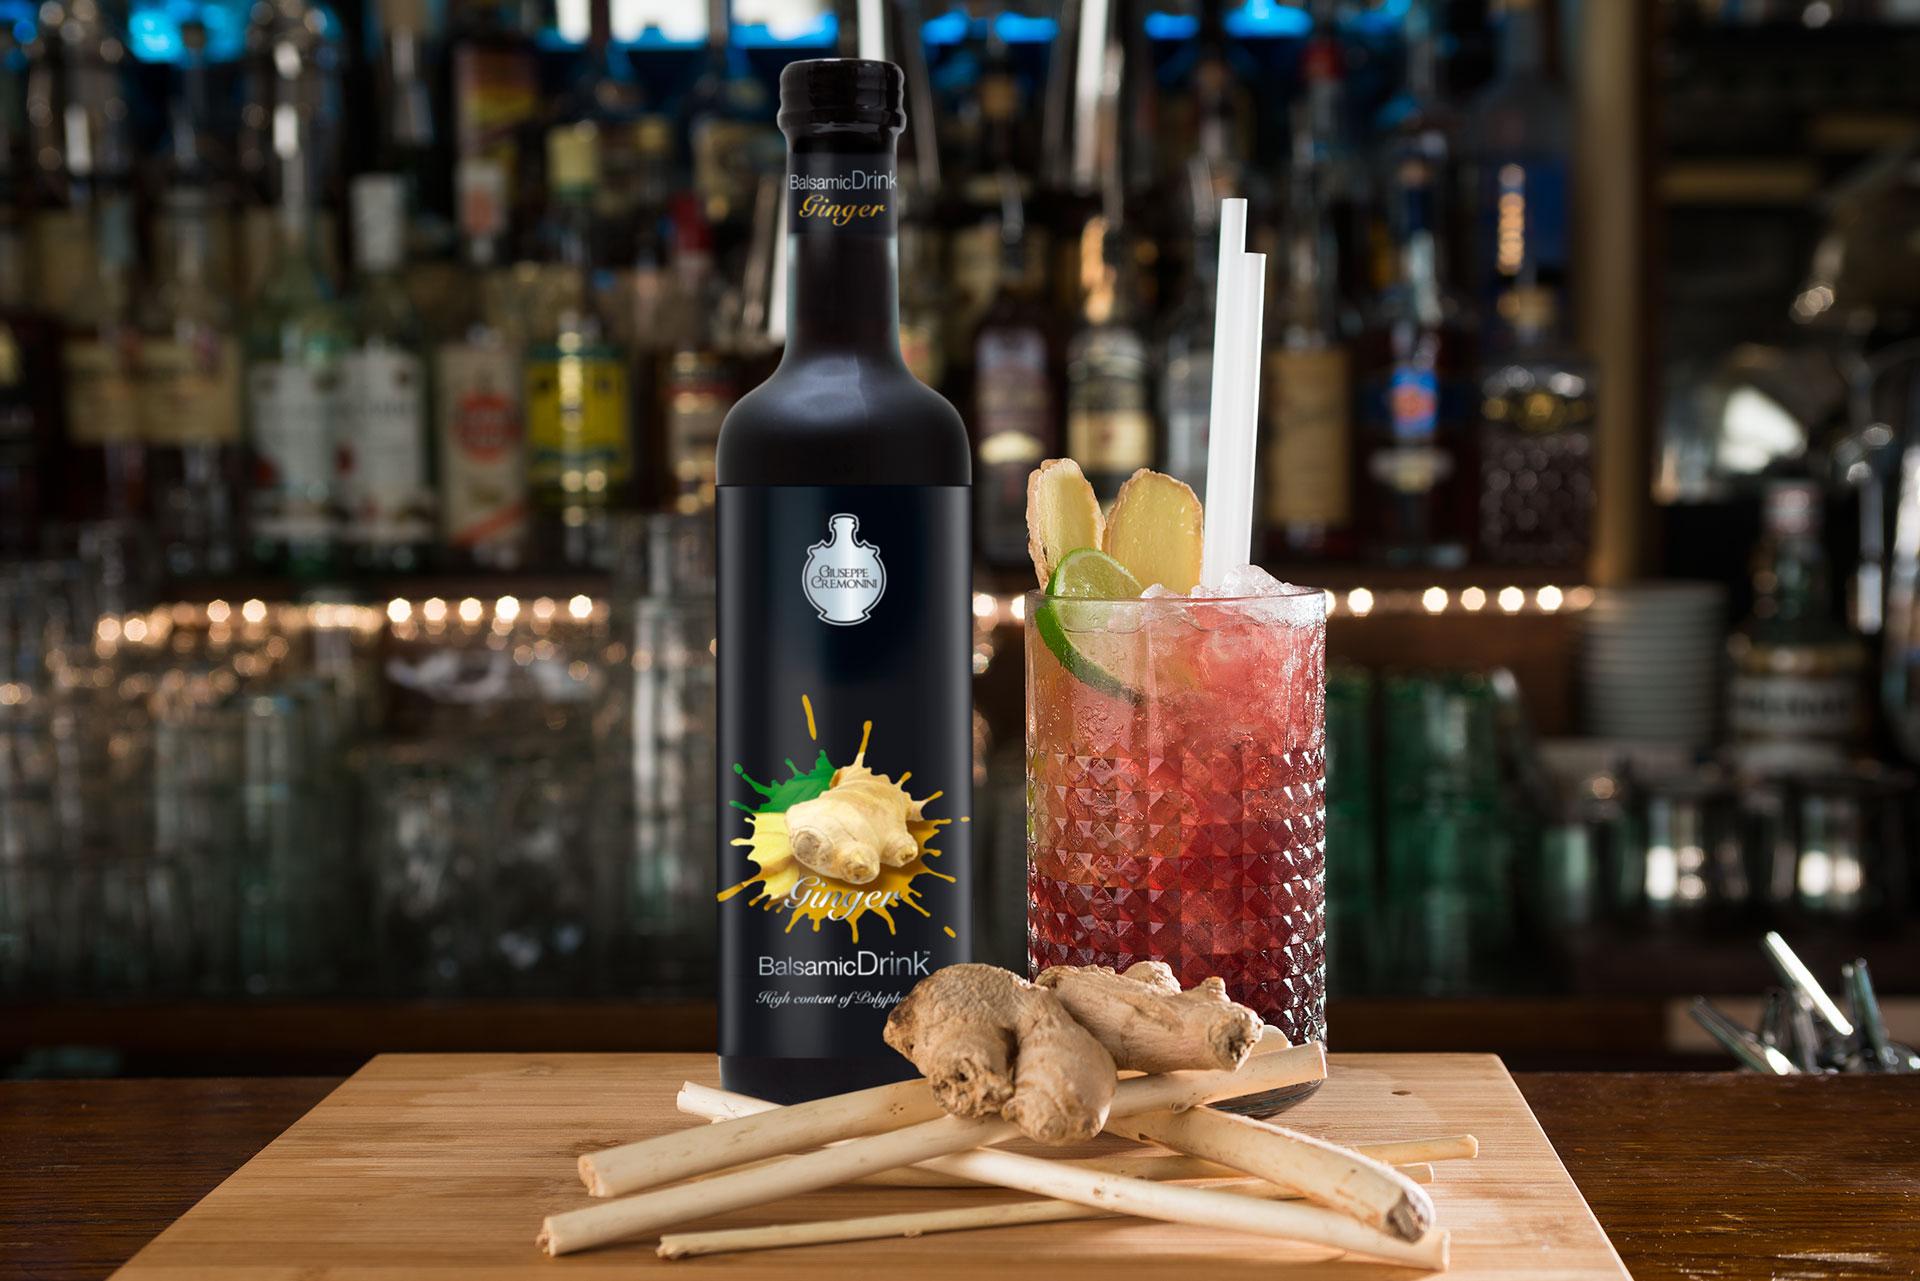 BalsamicDrink cocktail - Ginger Mule